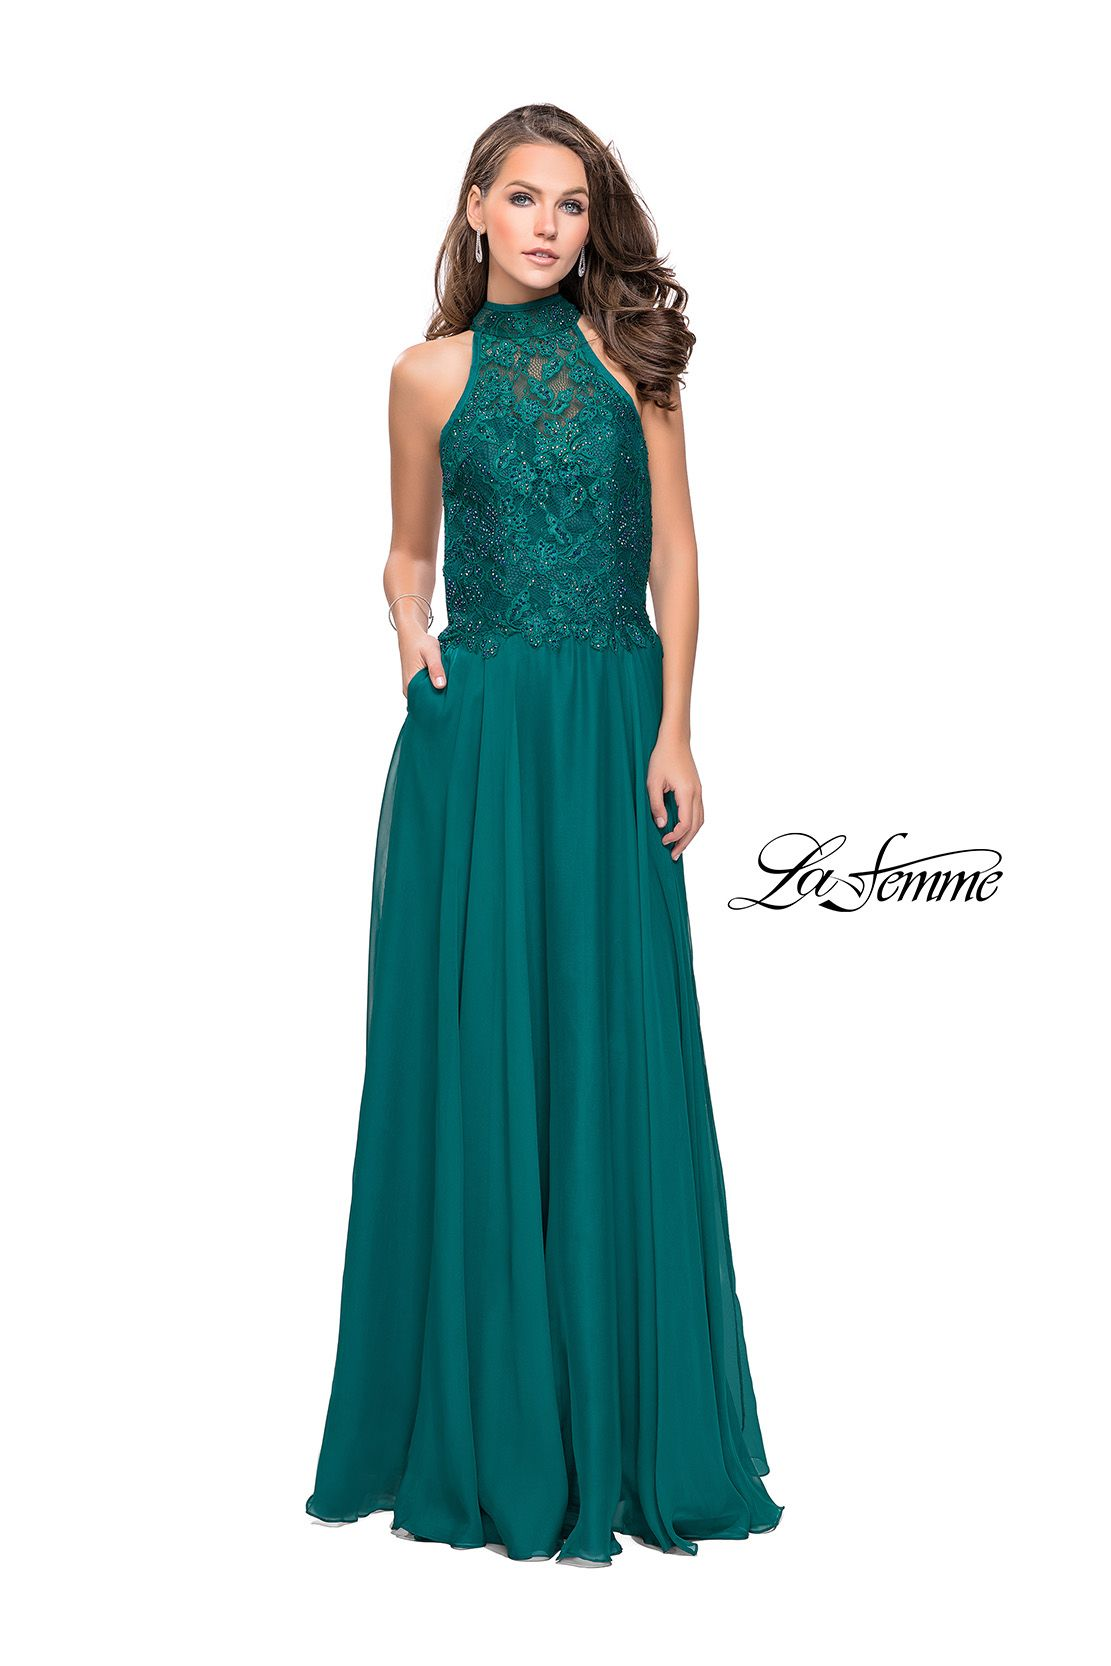 La Femme 25355- International Prom Association Dresses | La Femme ...